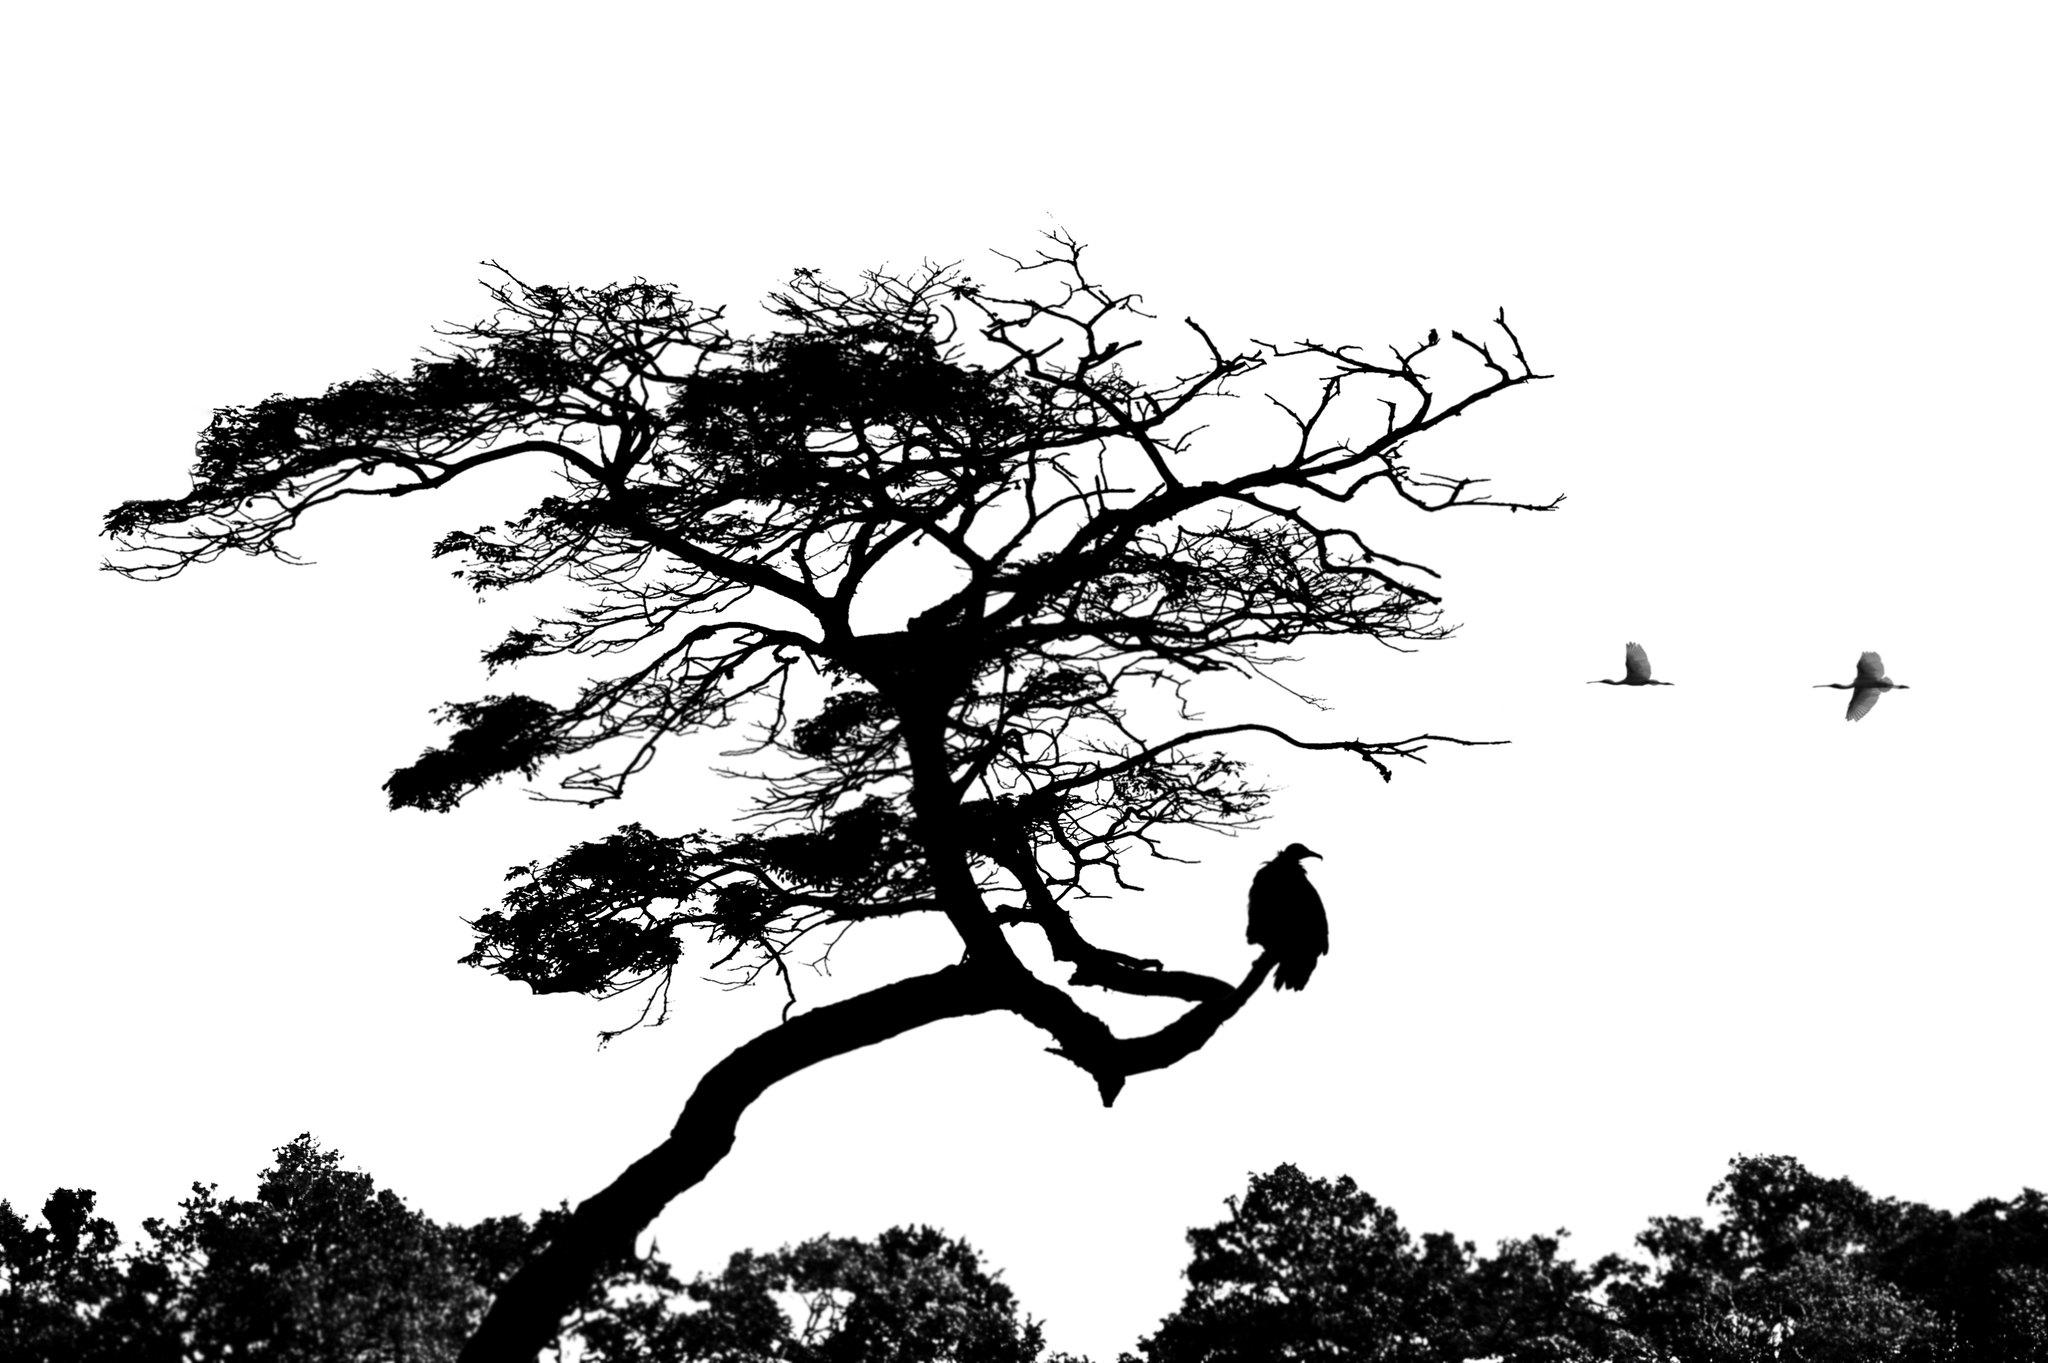 Tree Silhouette With Birds